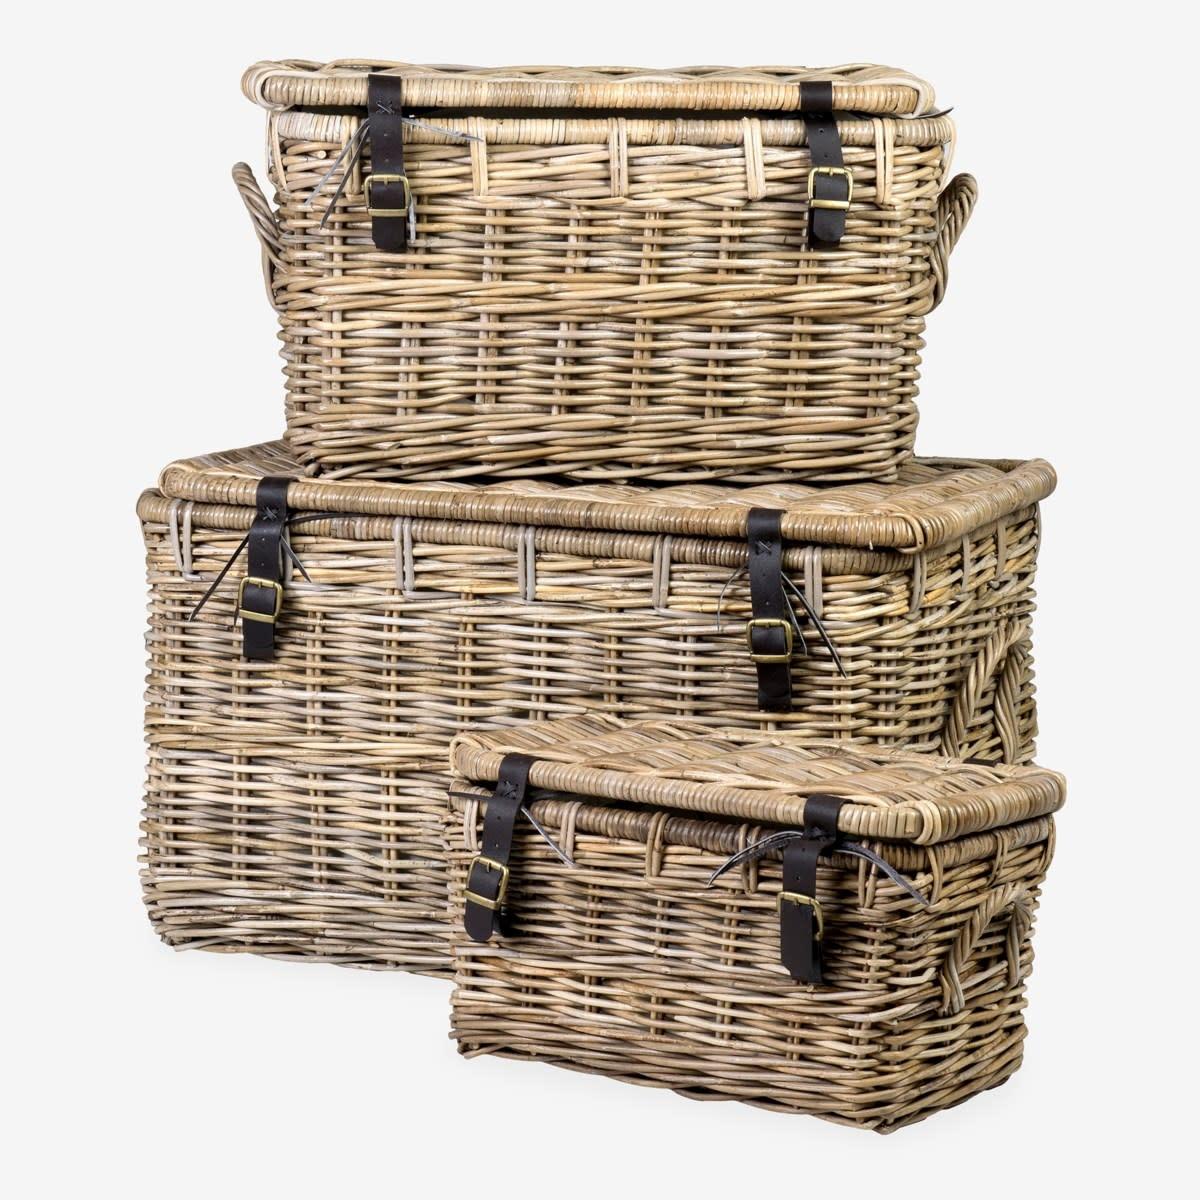 Marine Basket Small 19x11x11